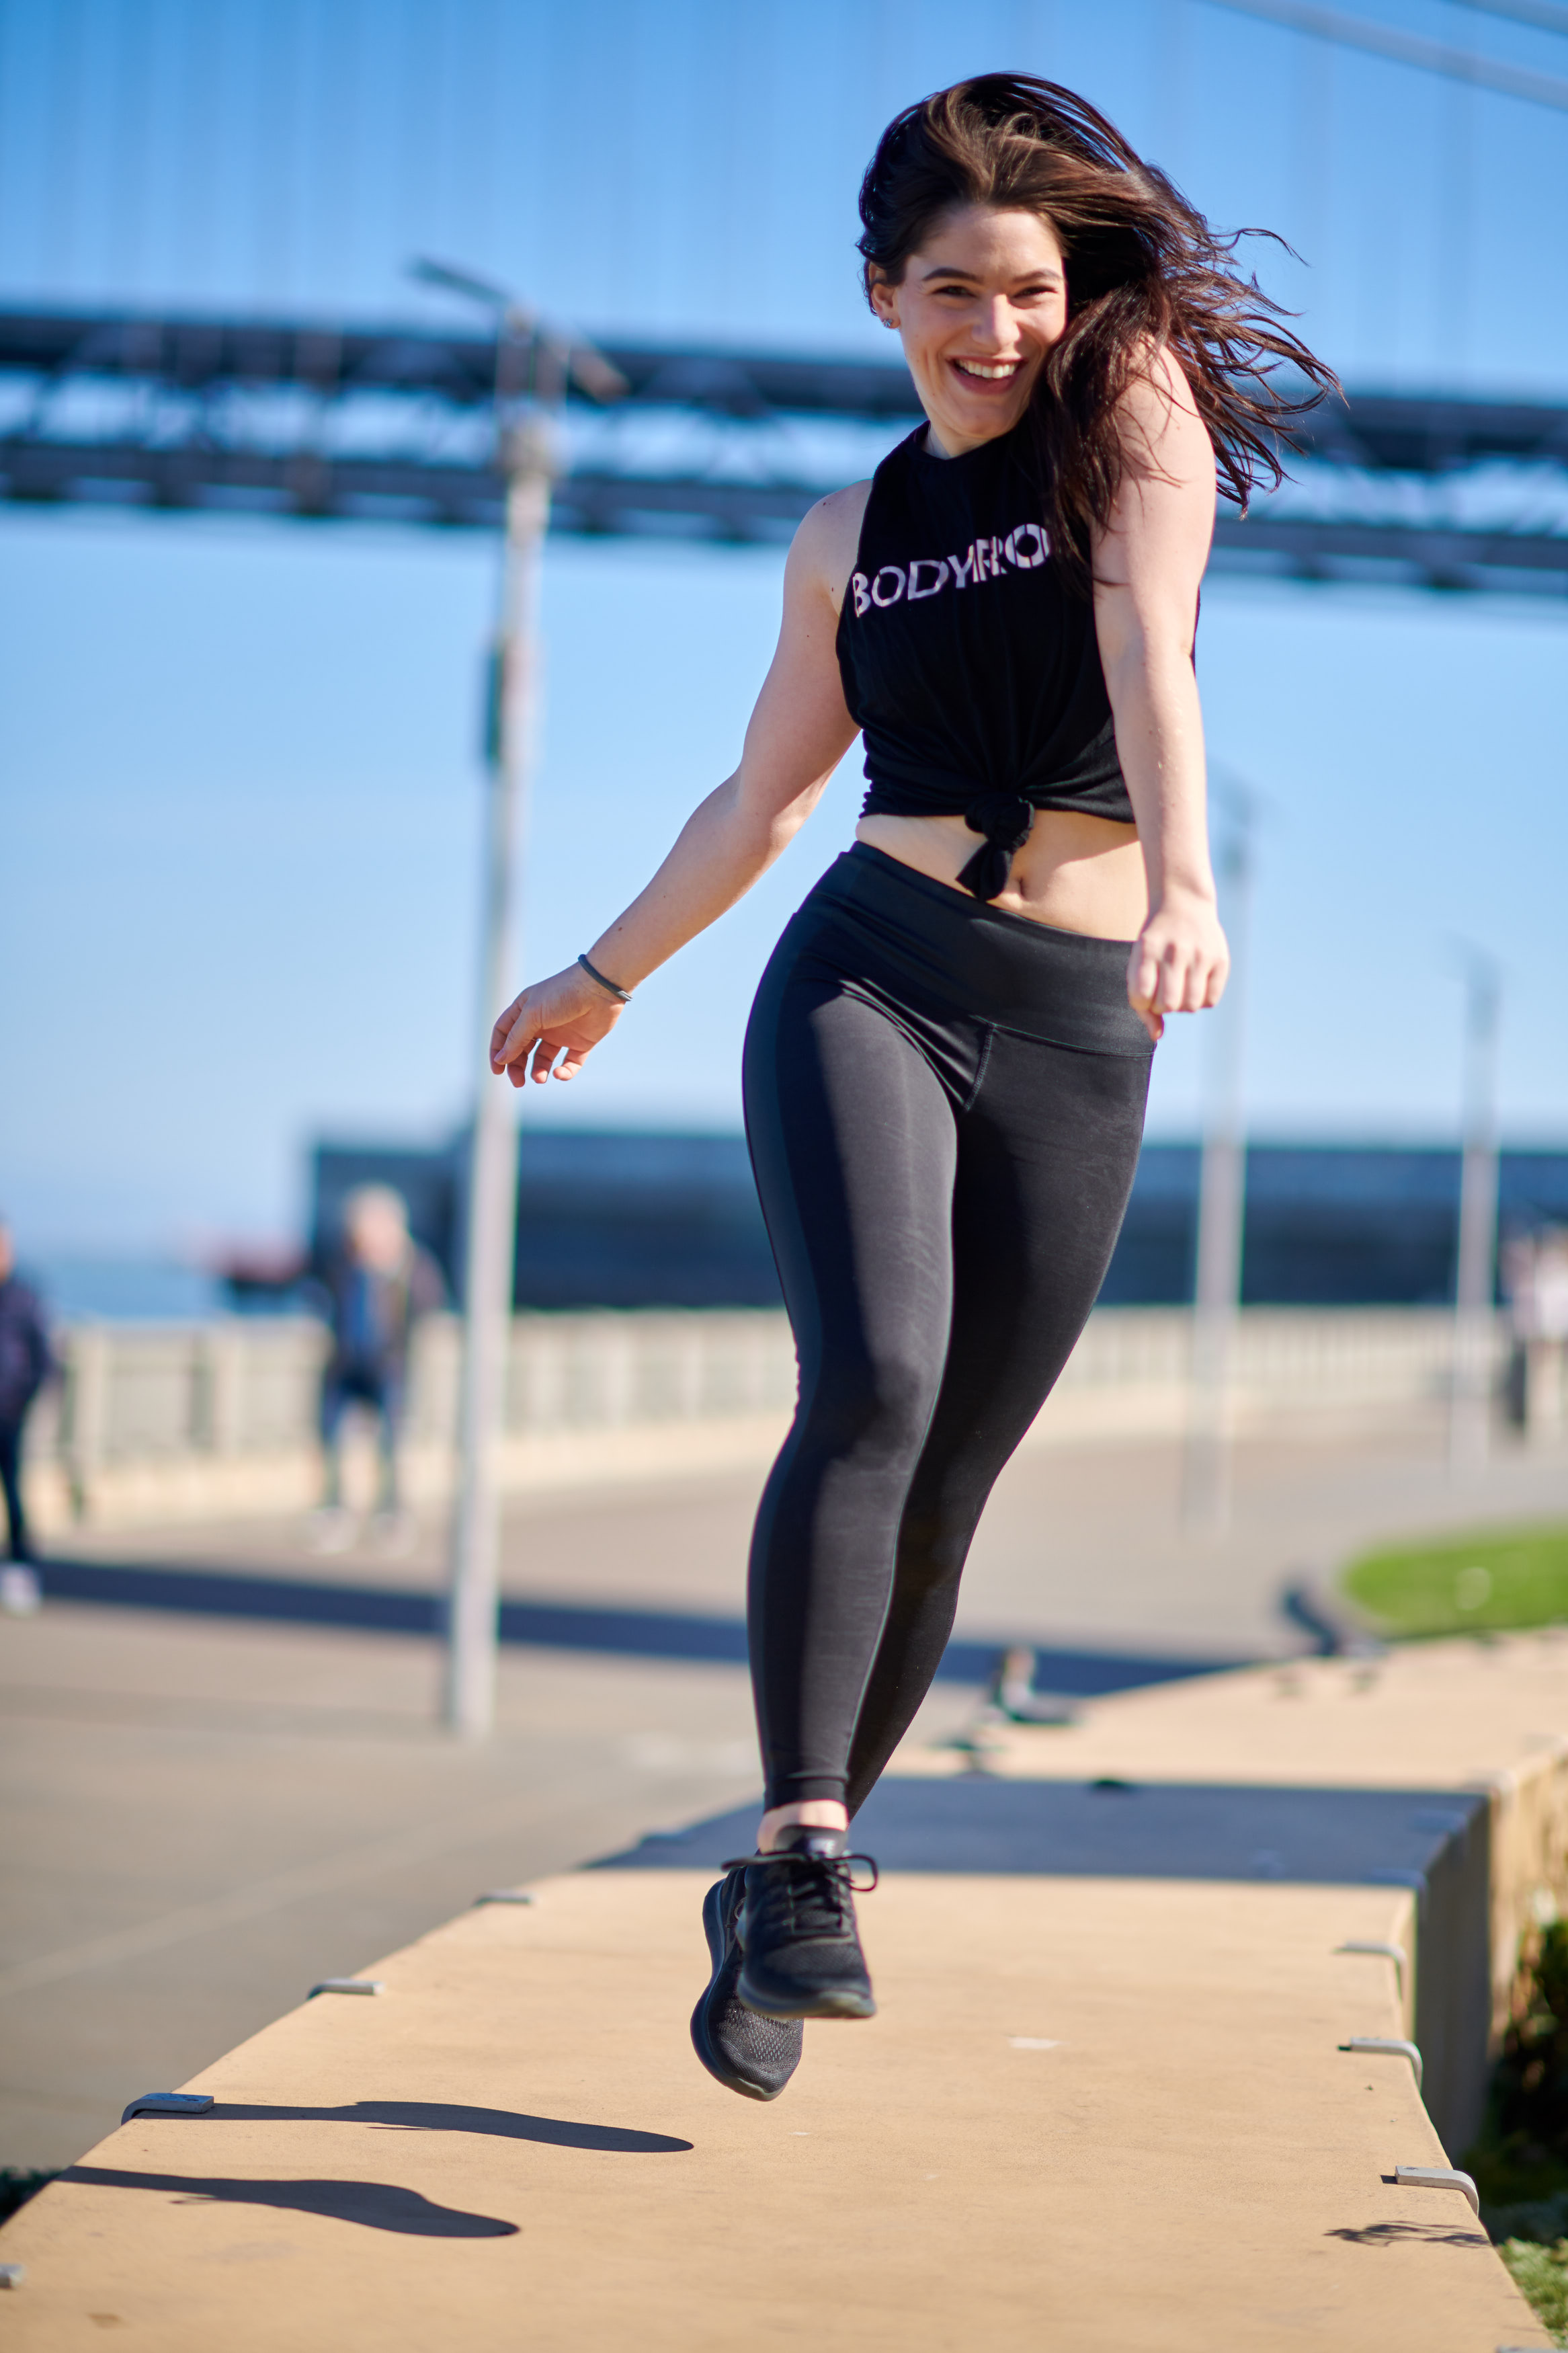 angela-fitness-profile-07.jpg